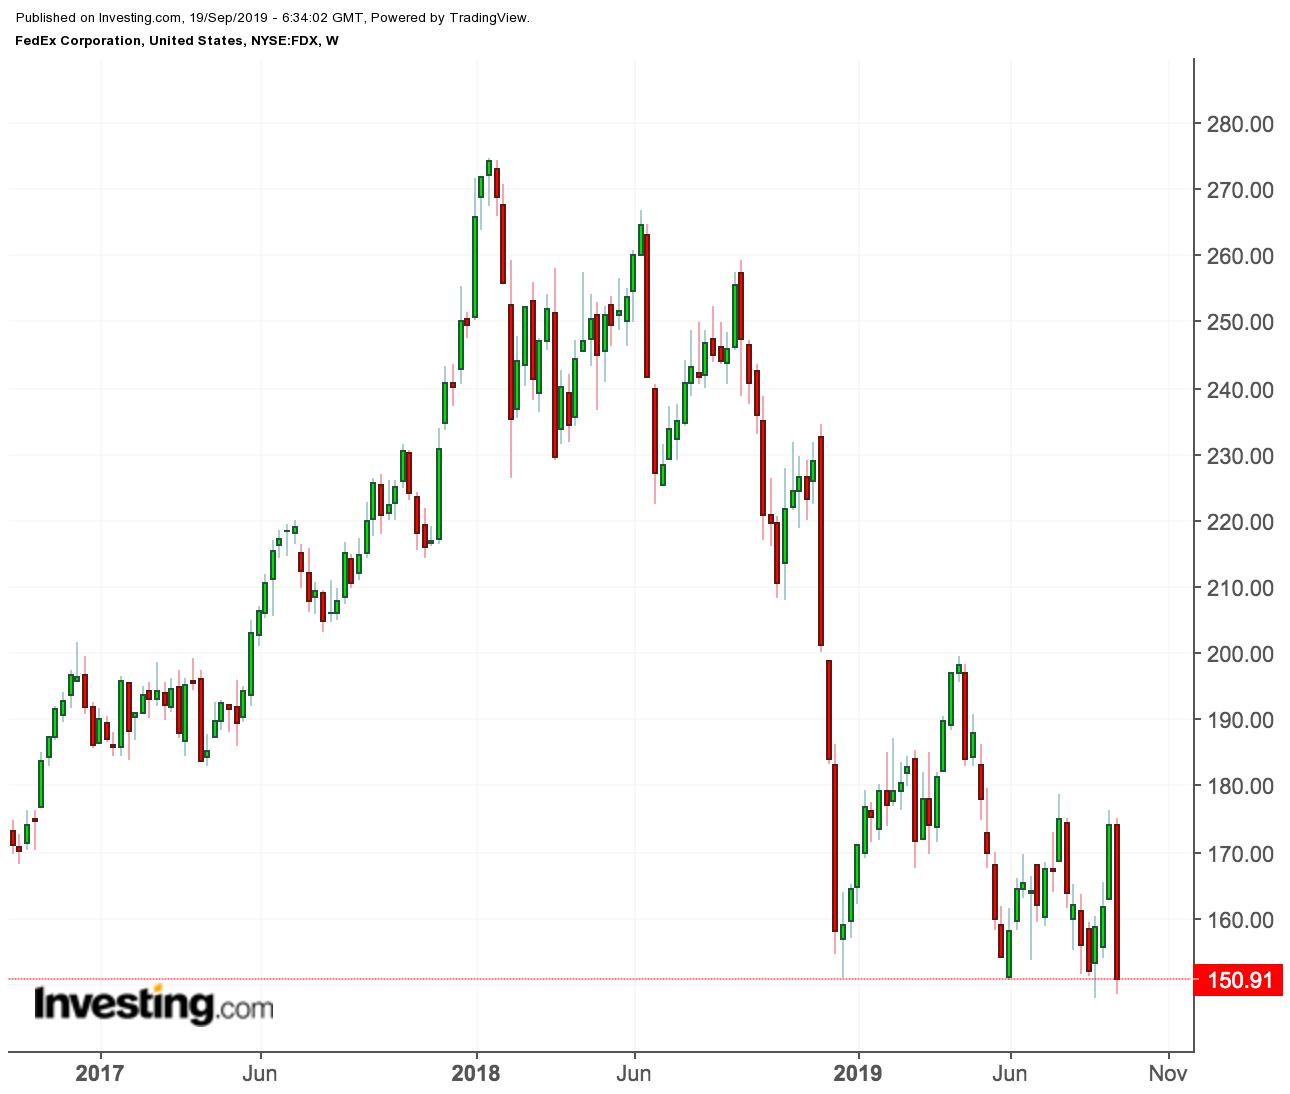 Fedex price chart